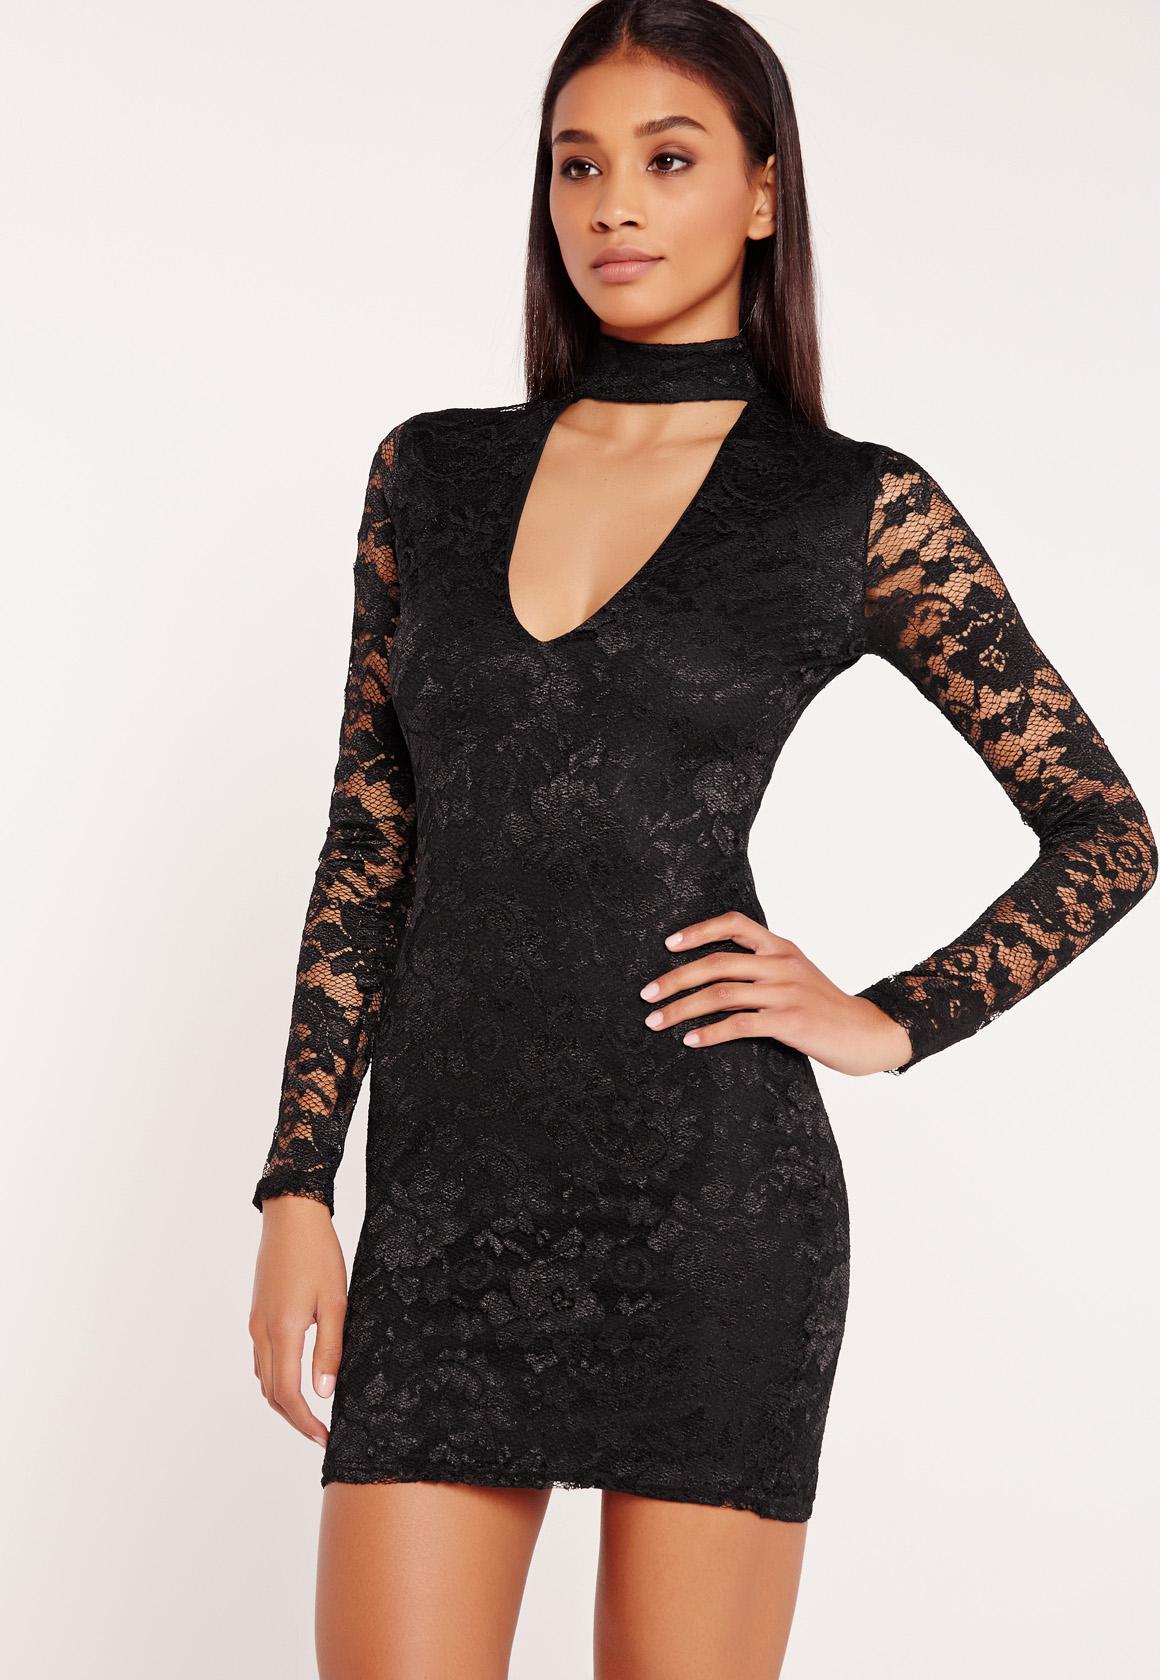 Black mini dress lace sleeves